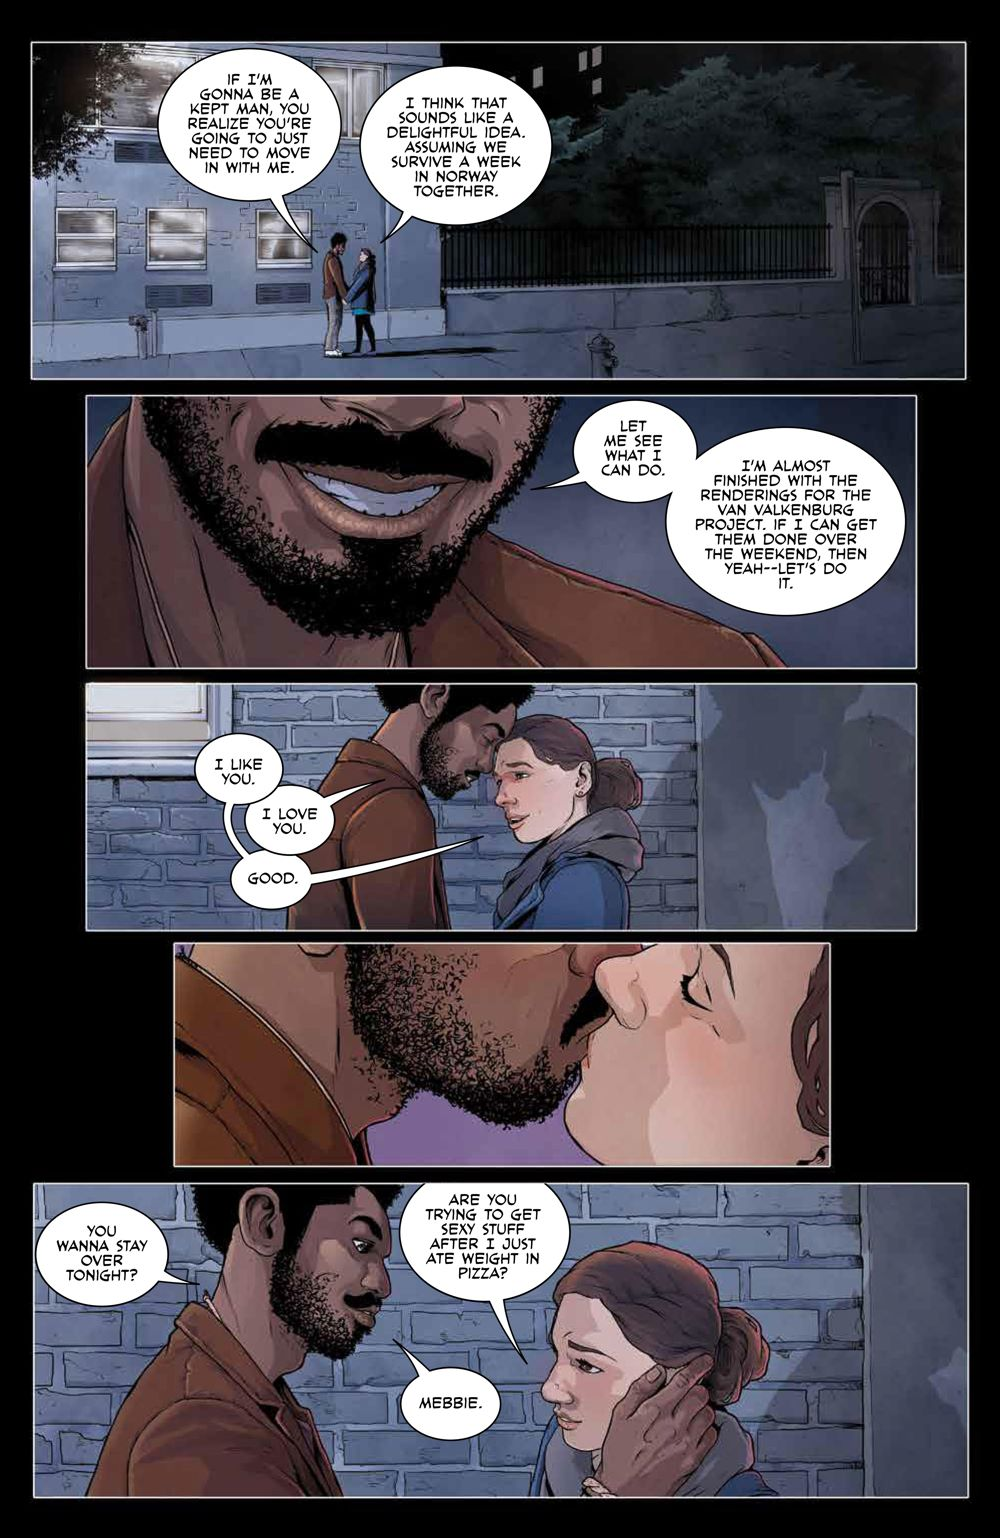 RedMother_v1_SC_PRESS_11 ComicList Previews: RED MOTHER VOLUME 1 TP